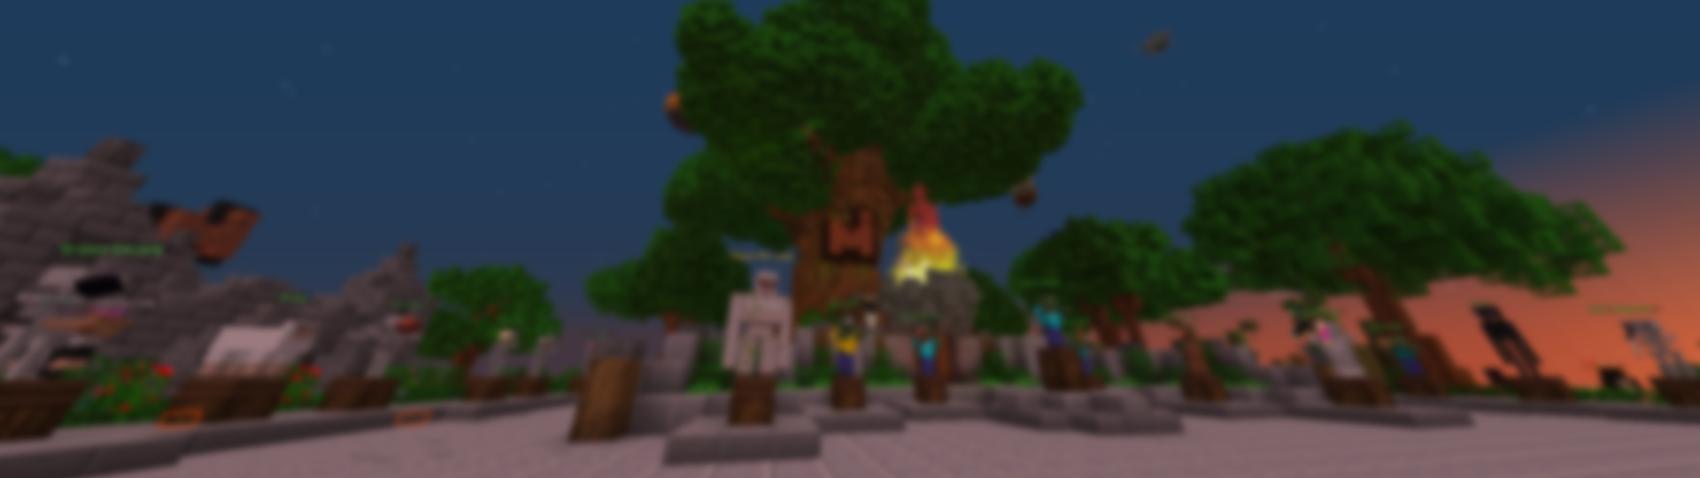 ZeroDay Minecraft Hacked Client